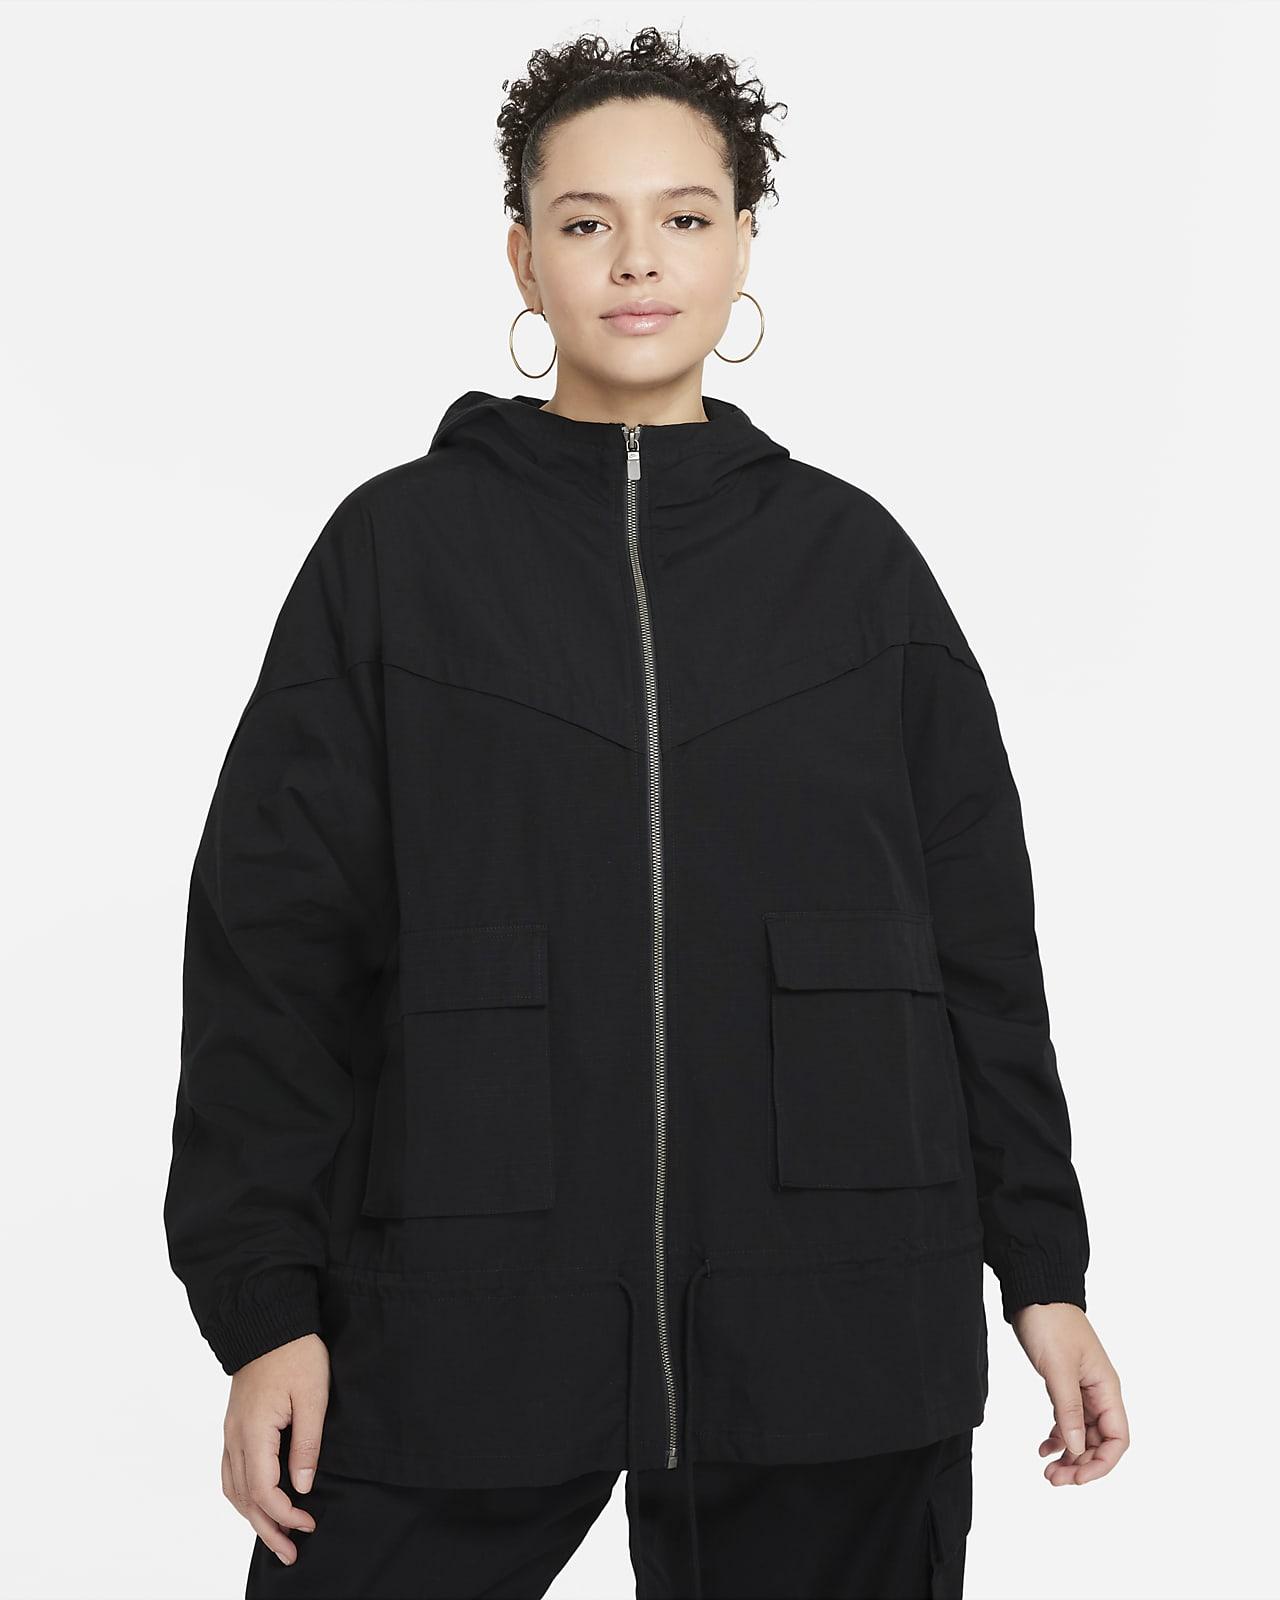 Nike Sportswear Icon Clash-jakke til kvinder (plus size)